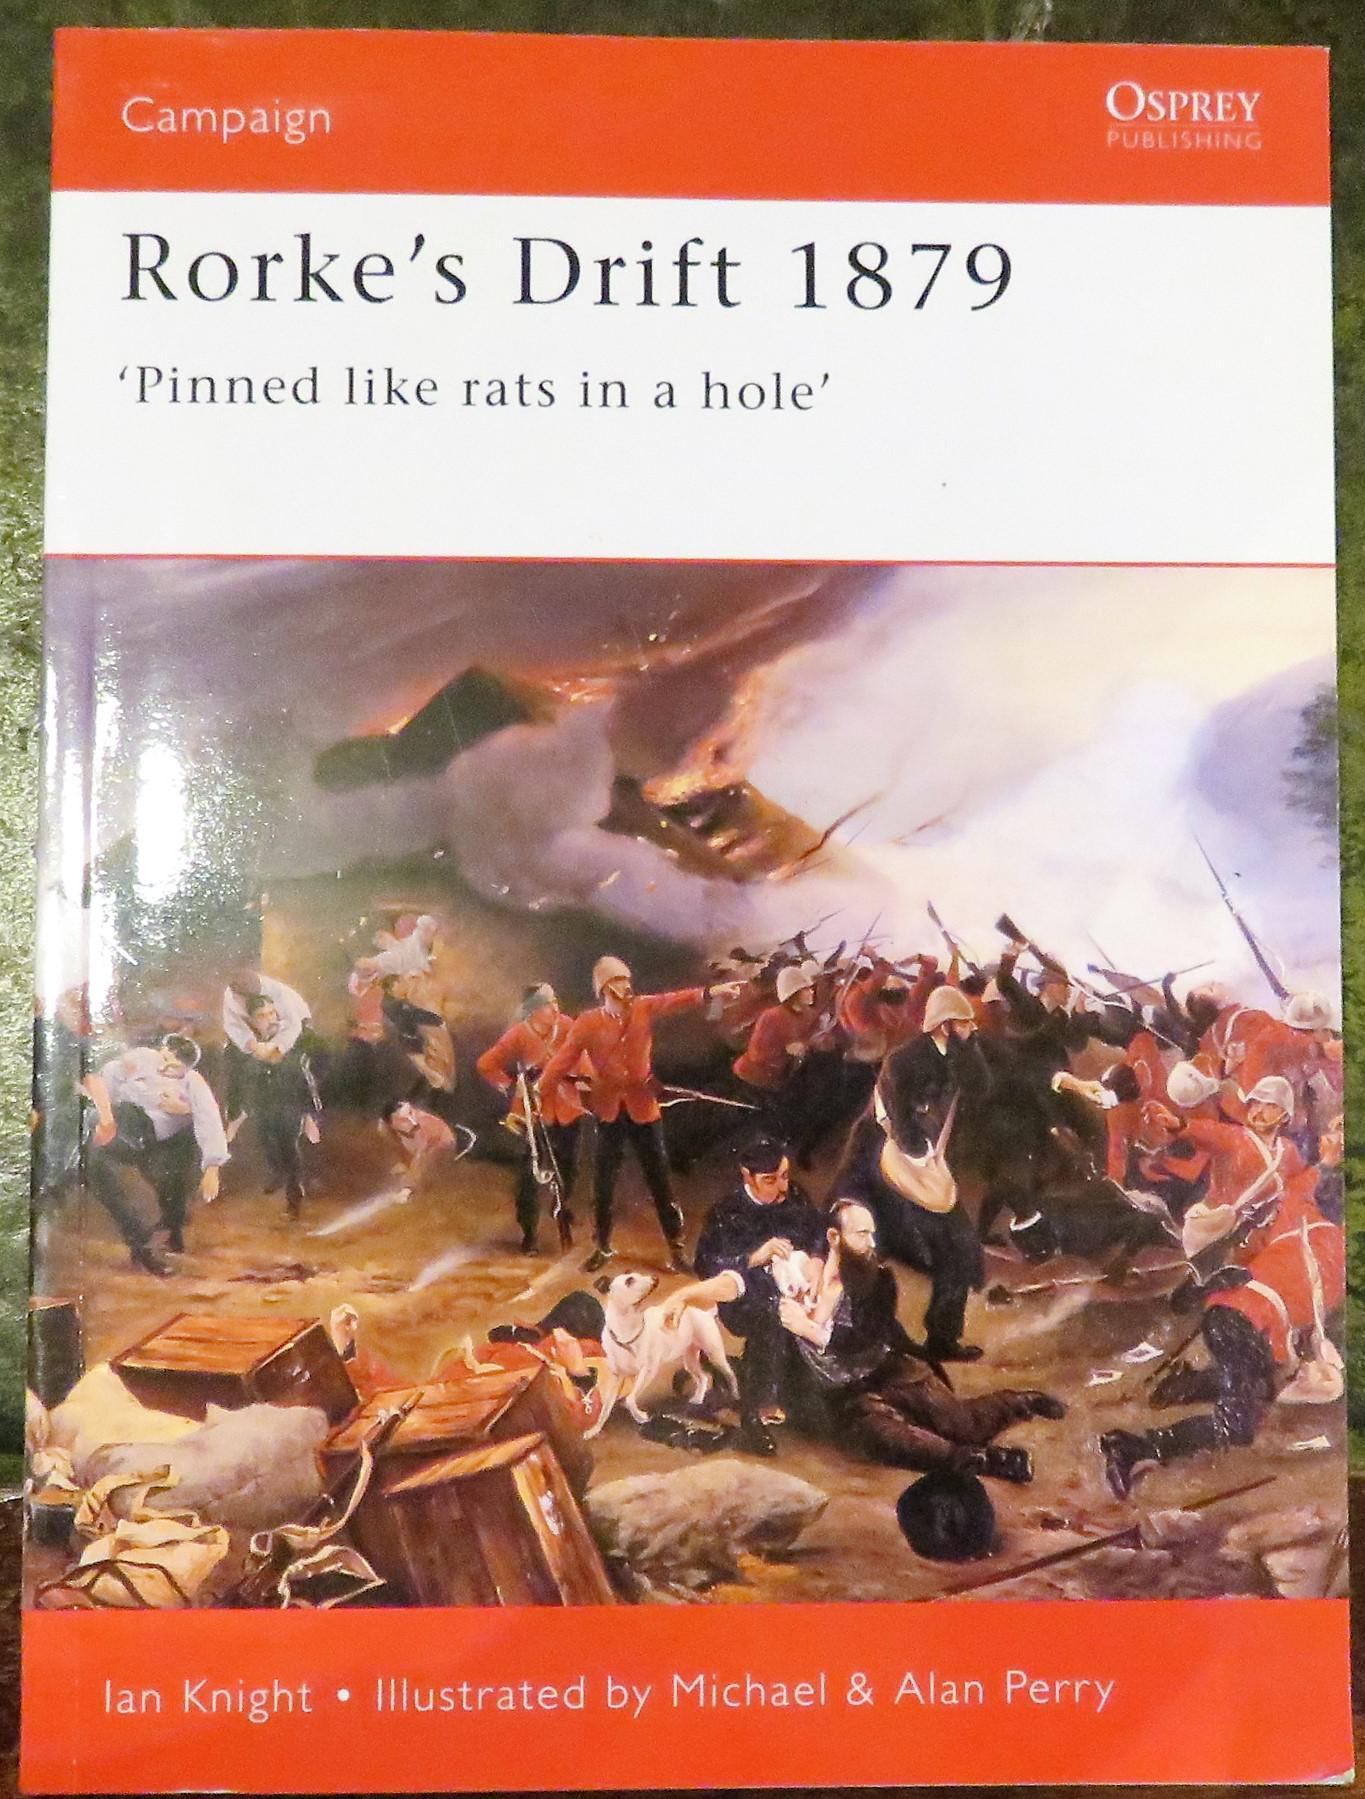 Rorke's Drift 1879 Pinned Like Rats in a Hole